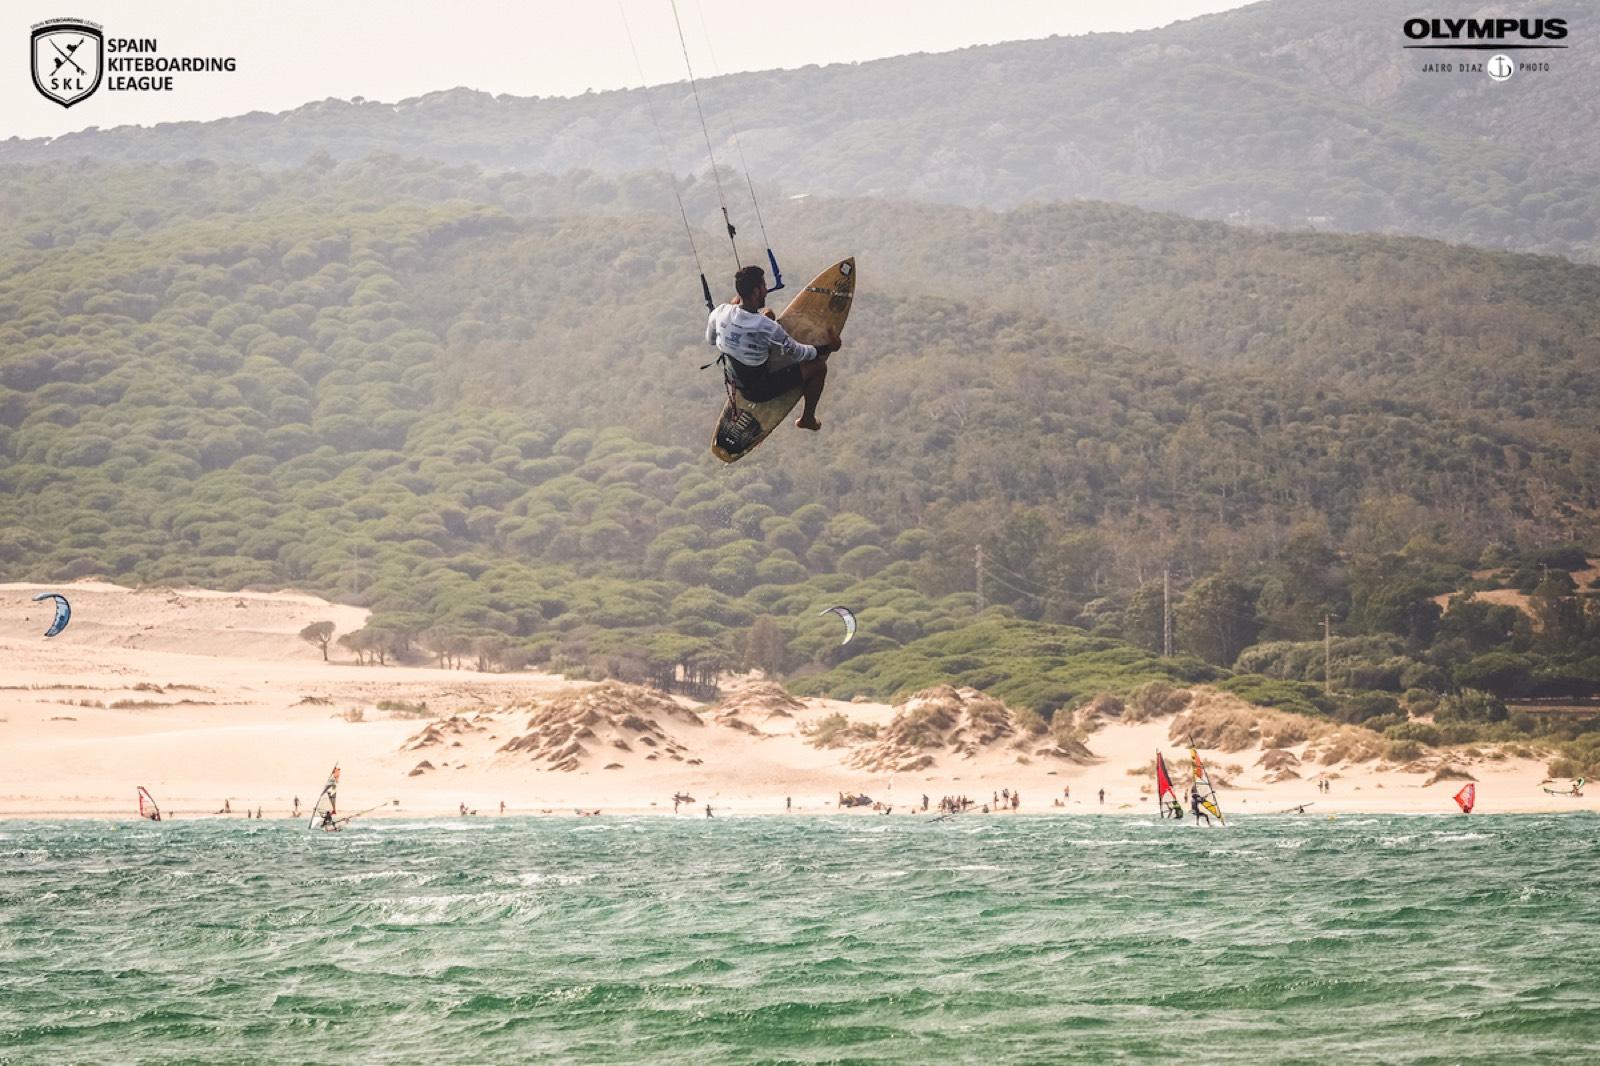 galeria-spain-kiteboarding-league-2018-26